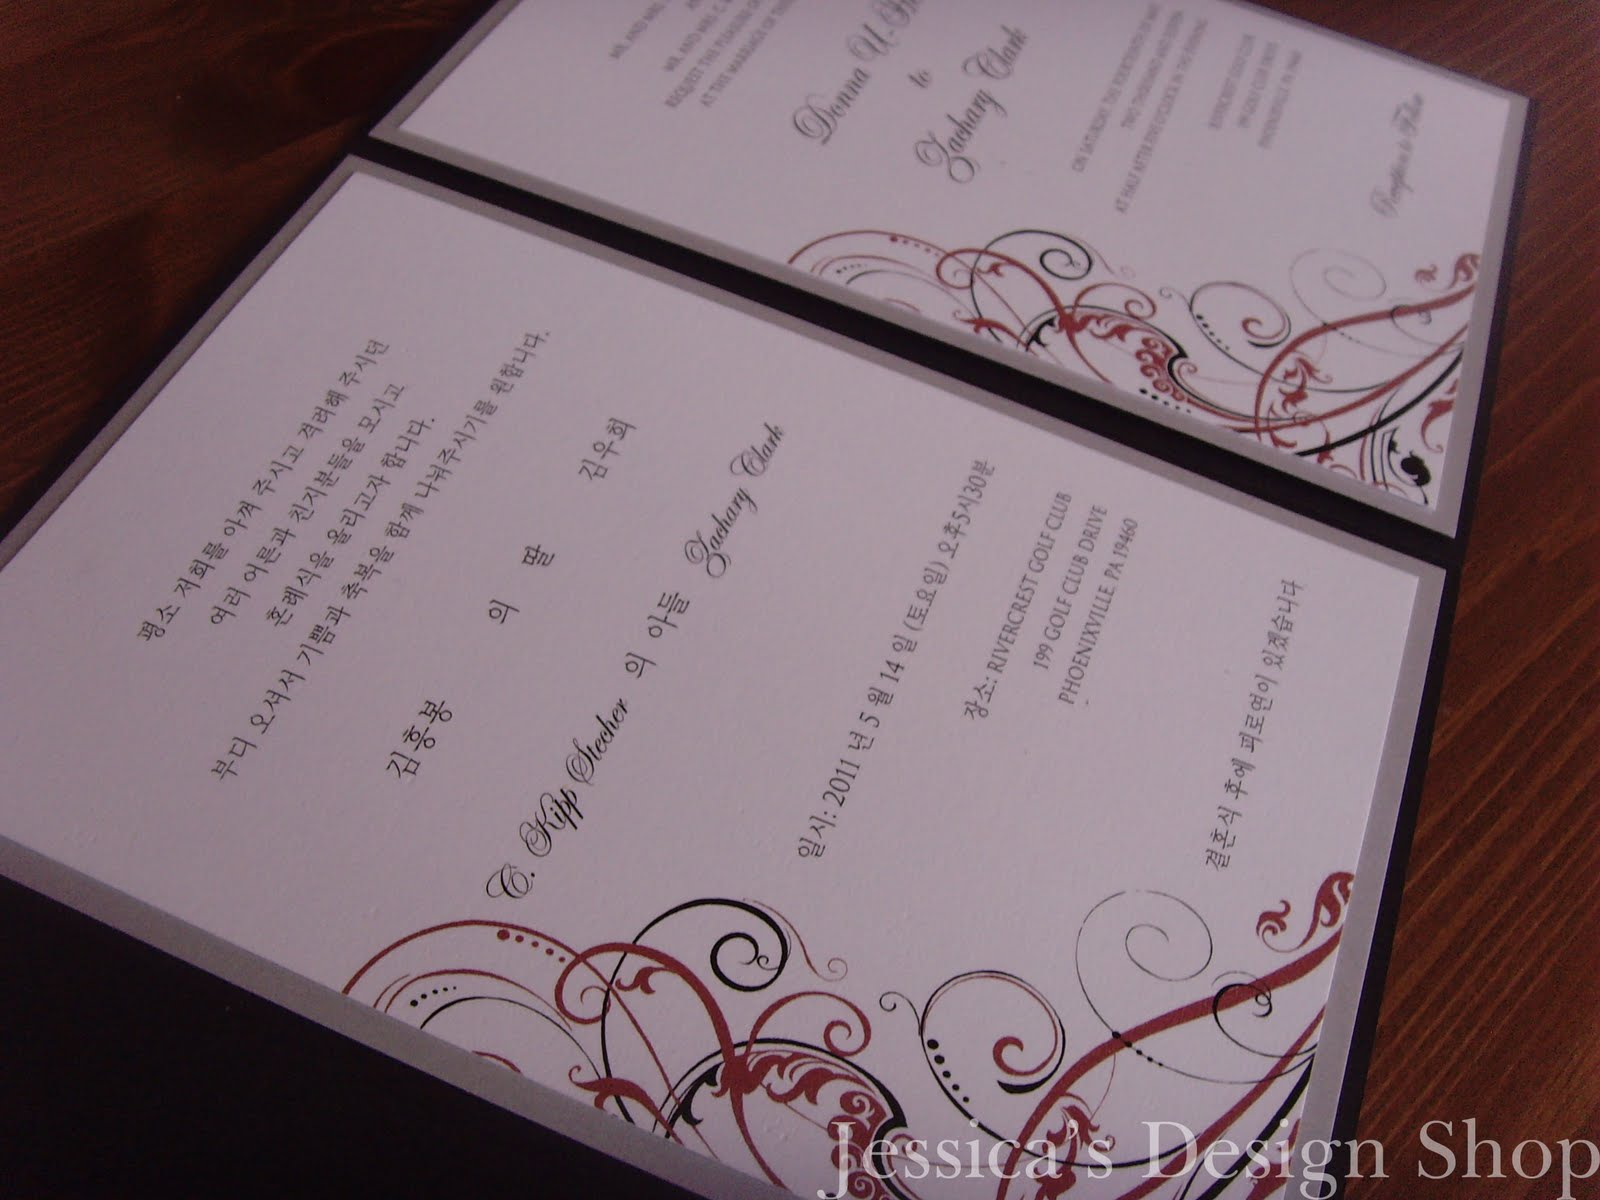 Jessicas design shop korean english wedding invitation korean english wedding invitation stopboris Gallery